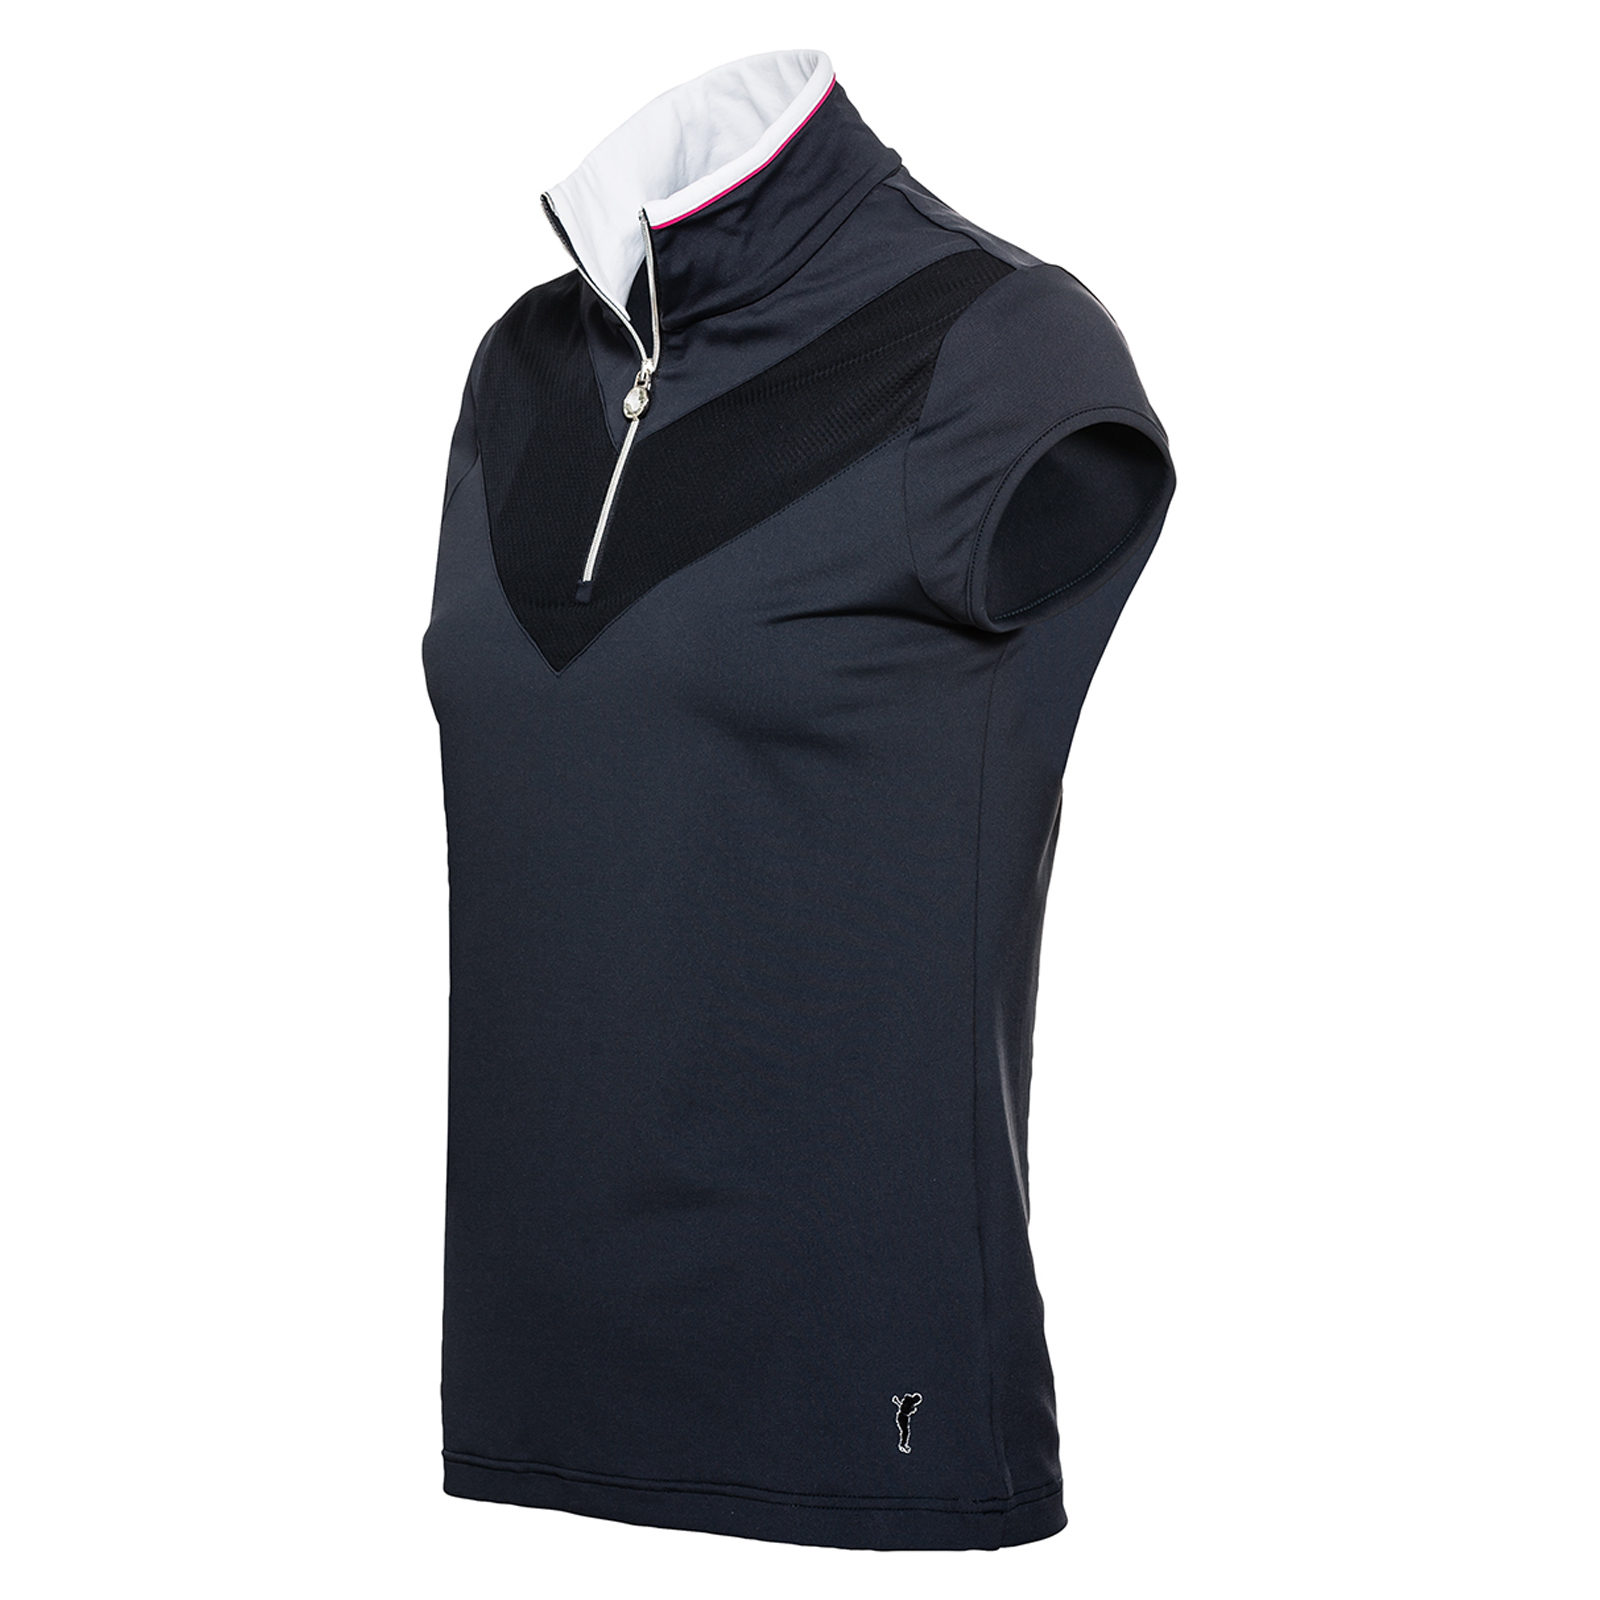 Damen Golf Polo mit Flügelärmel